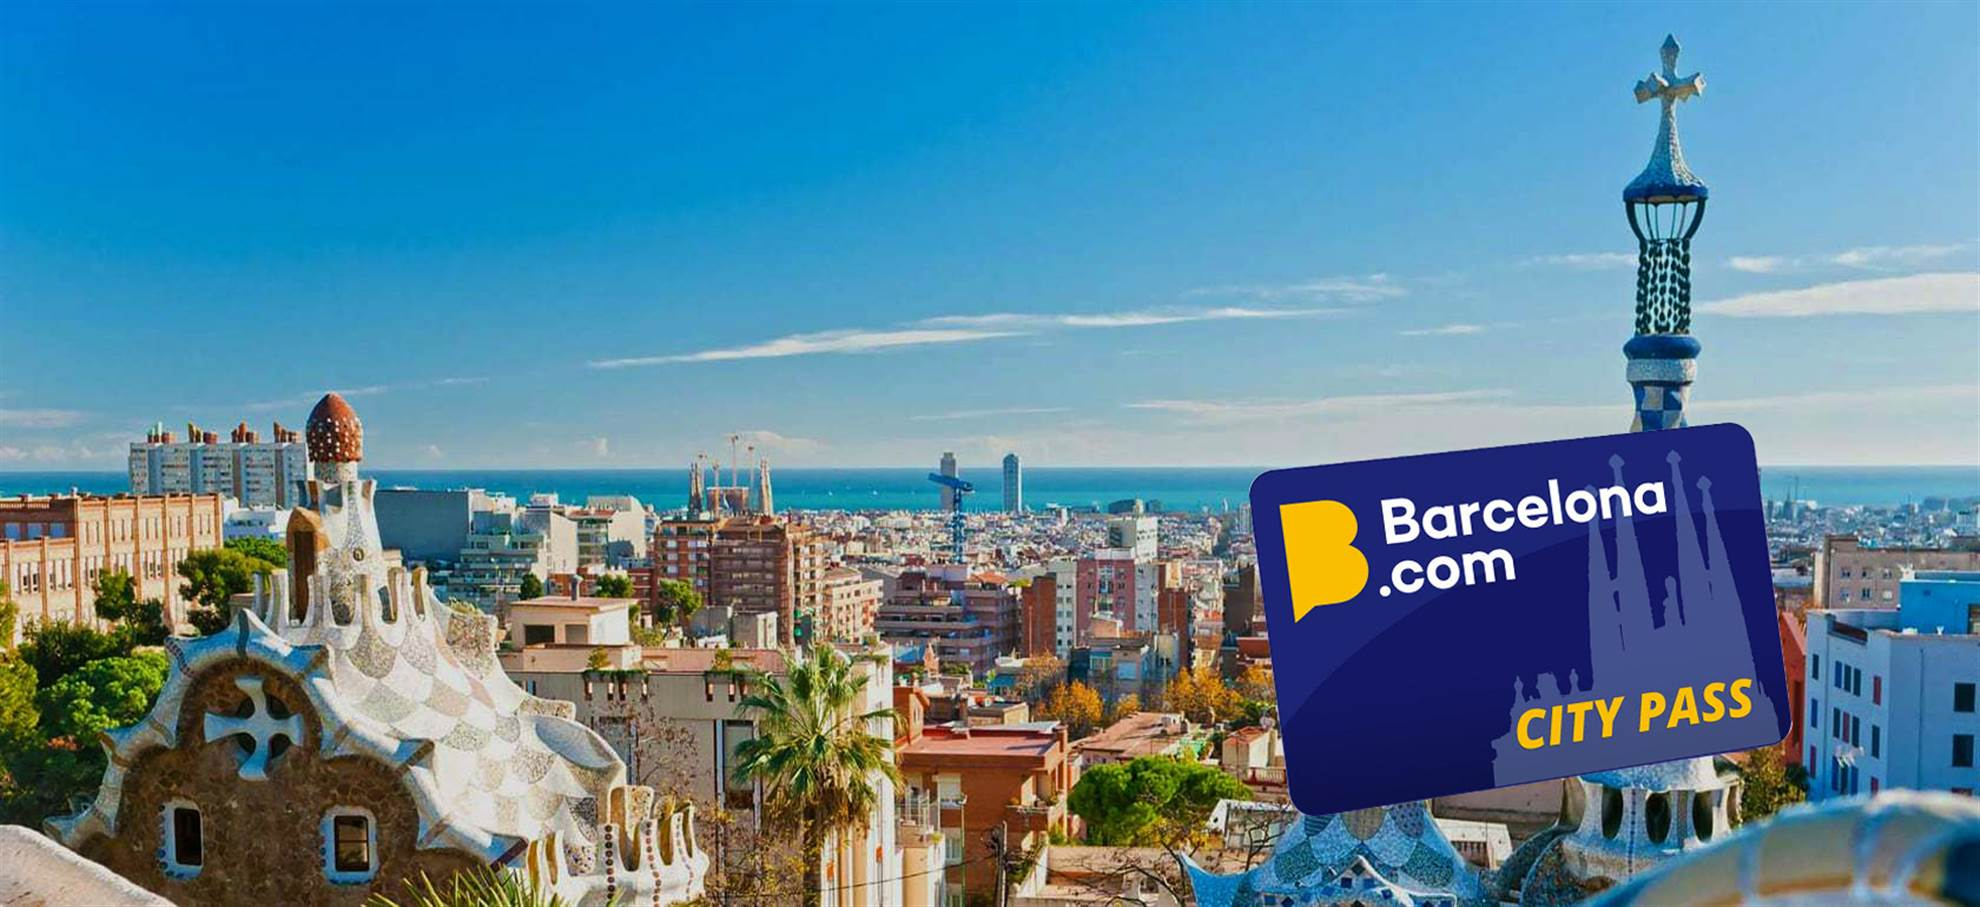 Барселона City Pass